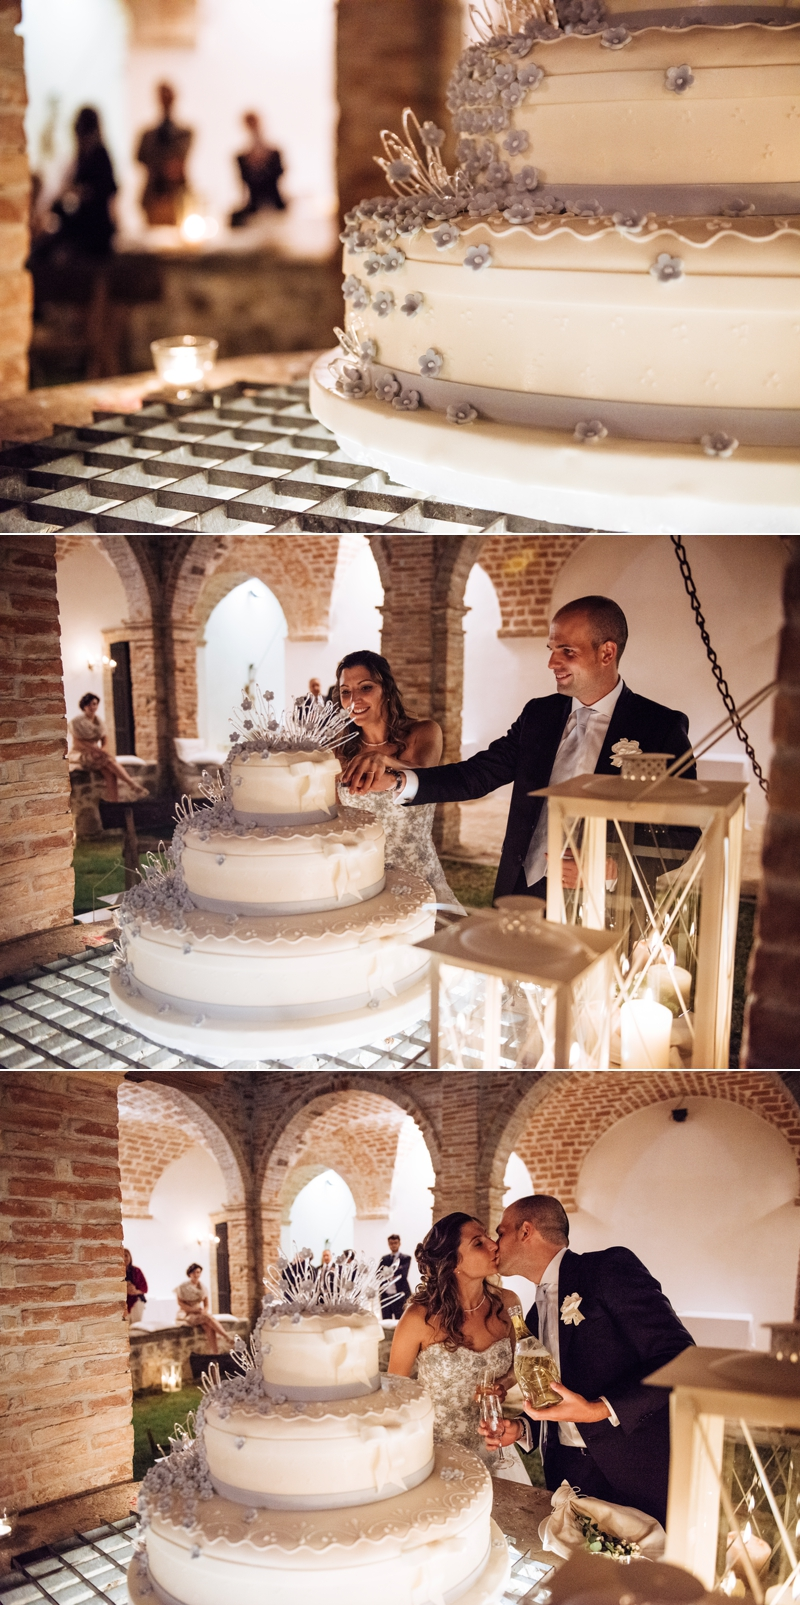 Fotografo Matrimonio Pieve del Tho Brisighella Monastero Scardavilla Meldola Valentina Cavallini 4